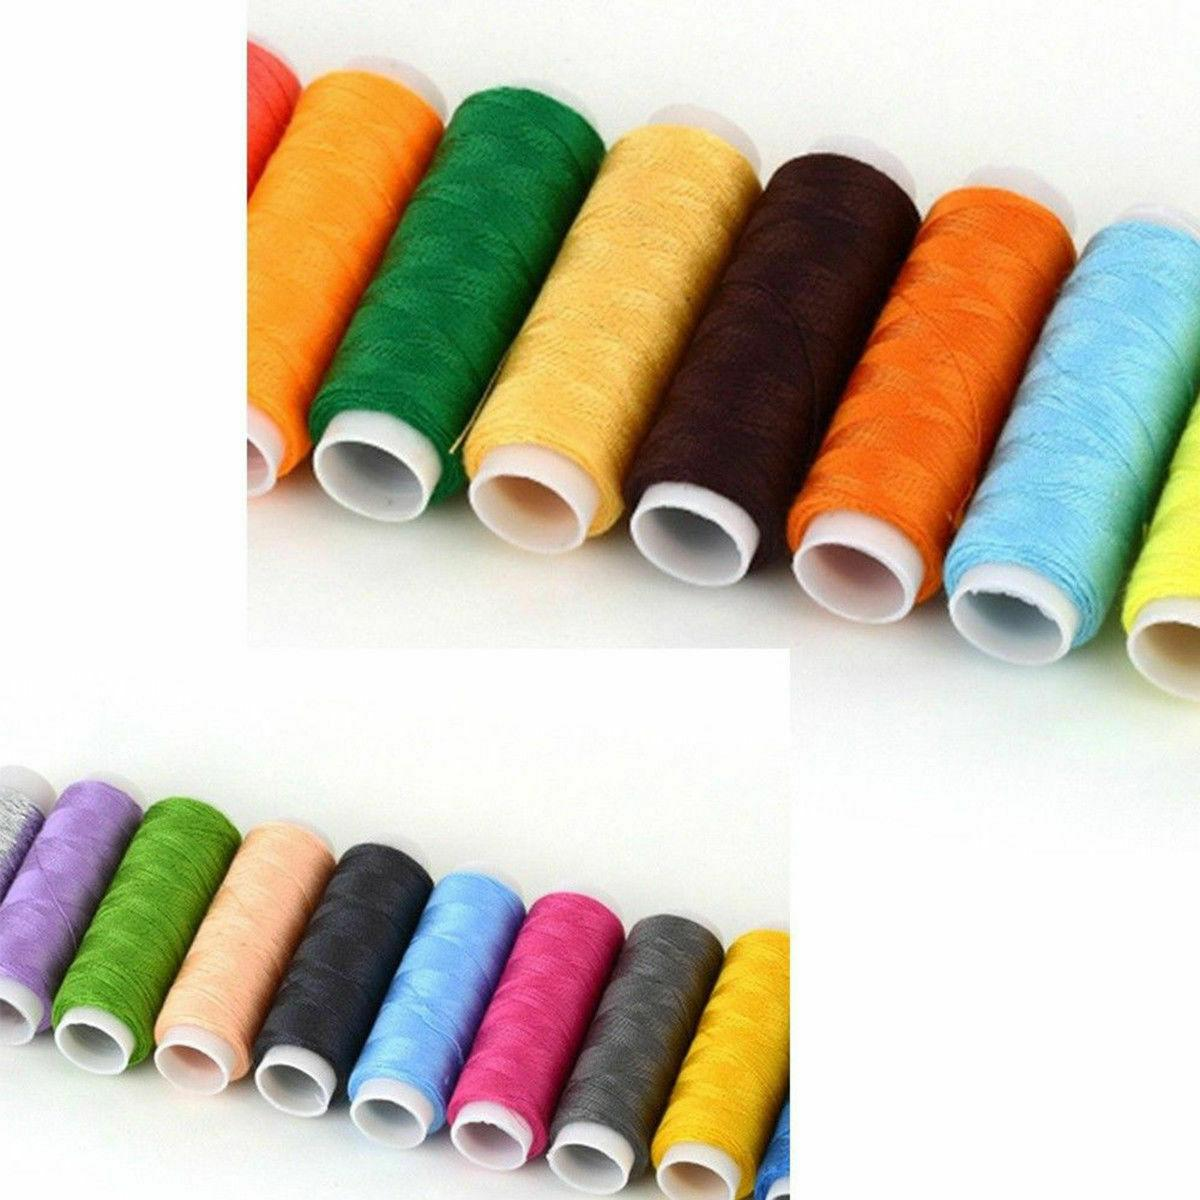 64 Rolls Sewing Line Bobbin Cotton Tape Kit